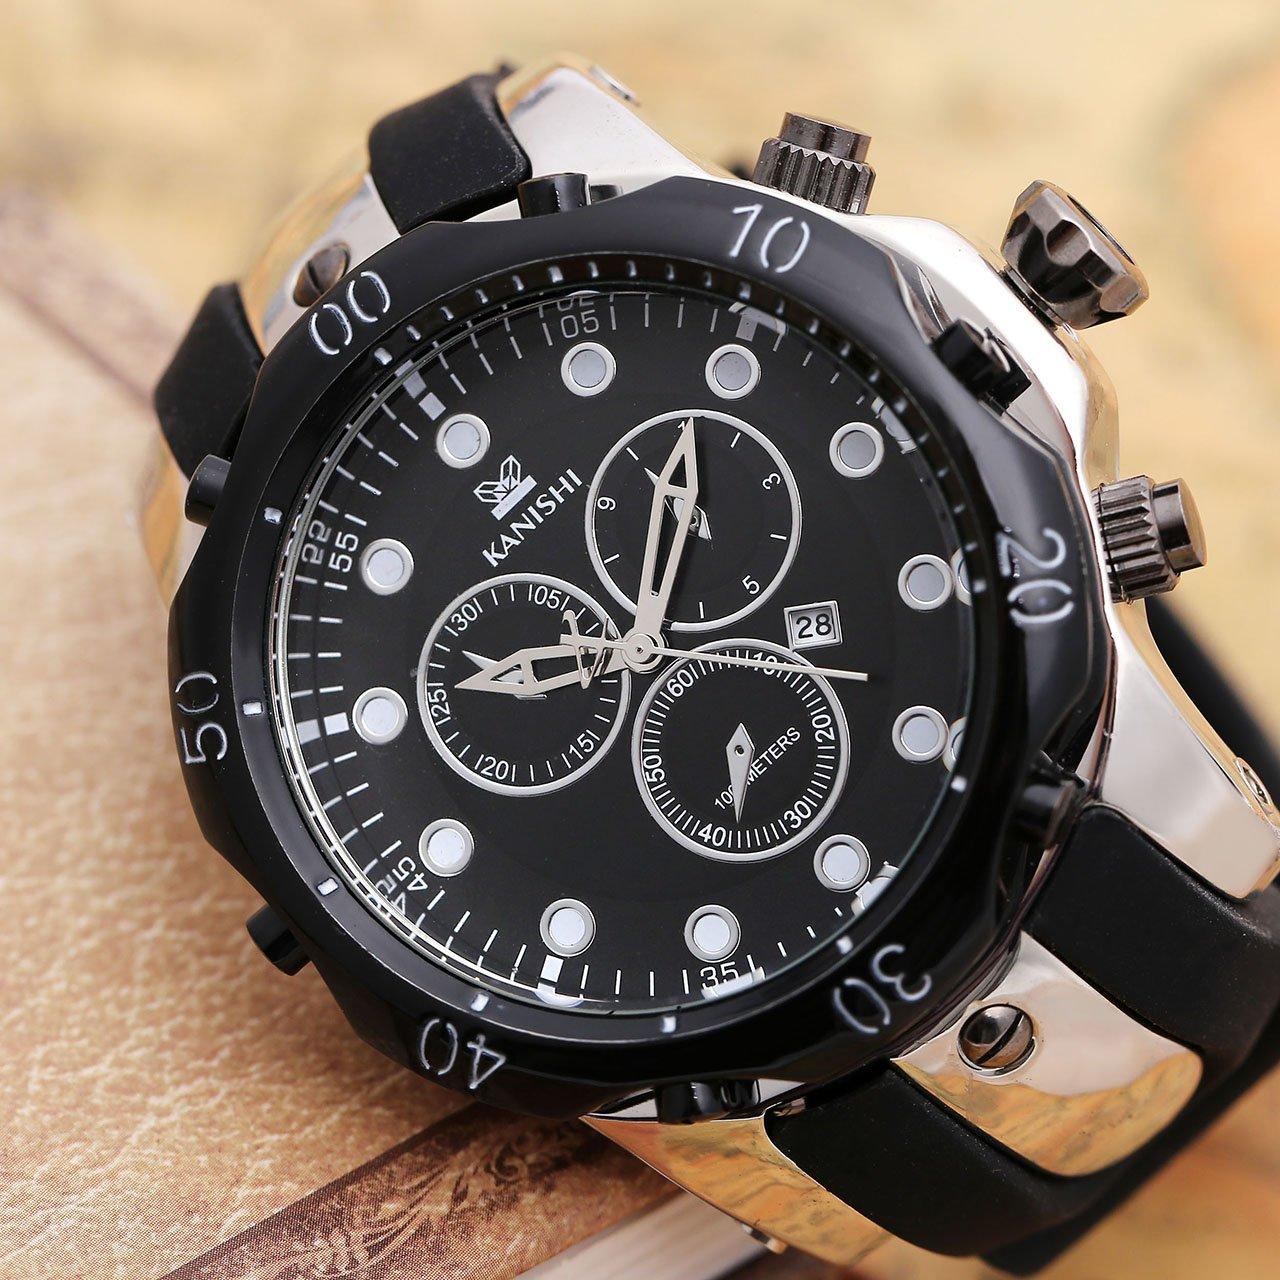 JSDDE Herren-Armbanduhr XL Herrenuhr Silikon Armband Kalenderuhr unecht Chronograph Analog Quarzuhr,Silber+Schwarz